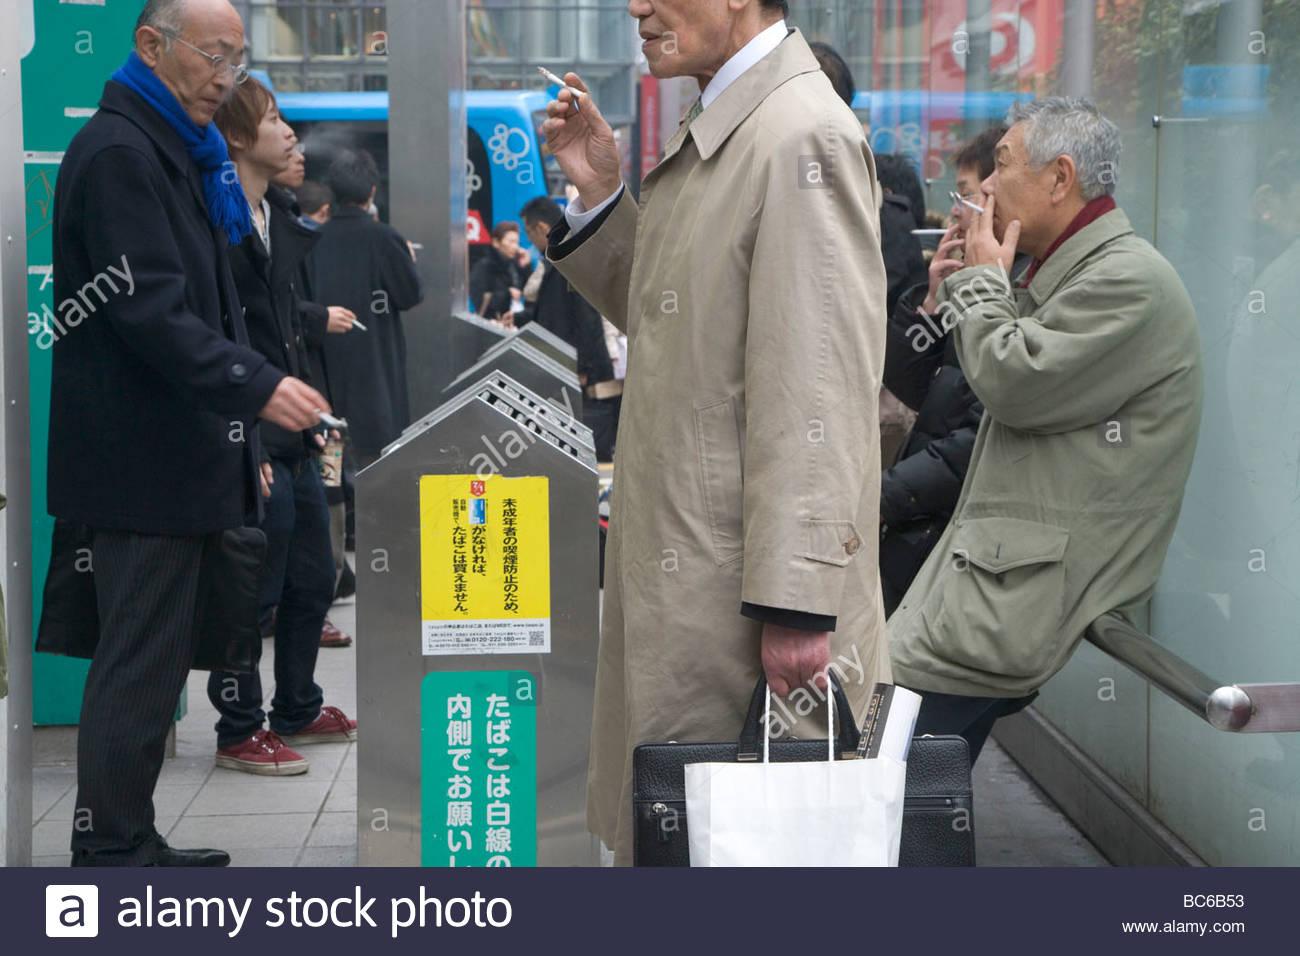 designated smokers area tokyo at Shibuya station - Stock Image